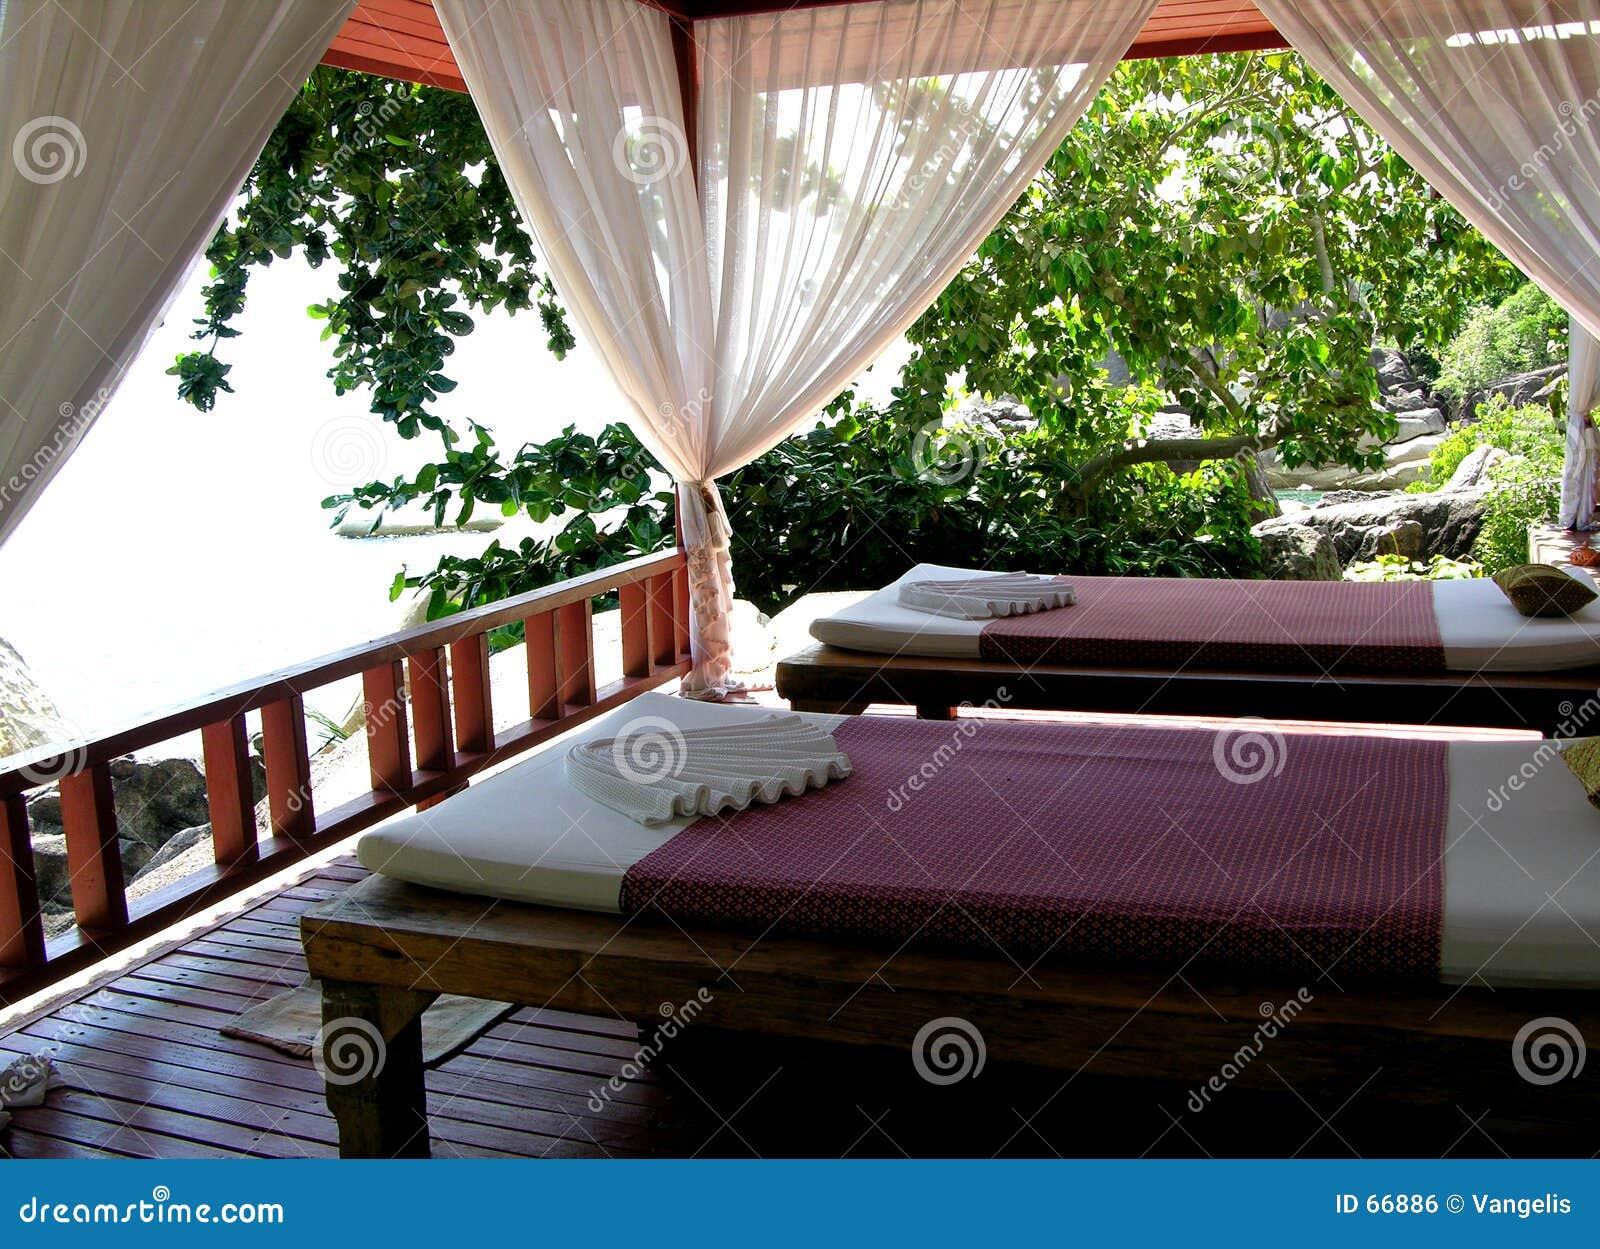 Thai Massage Area